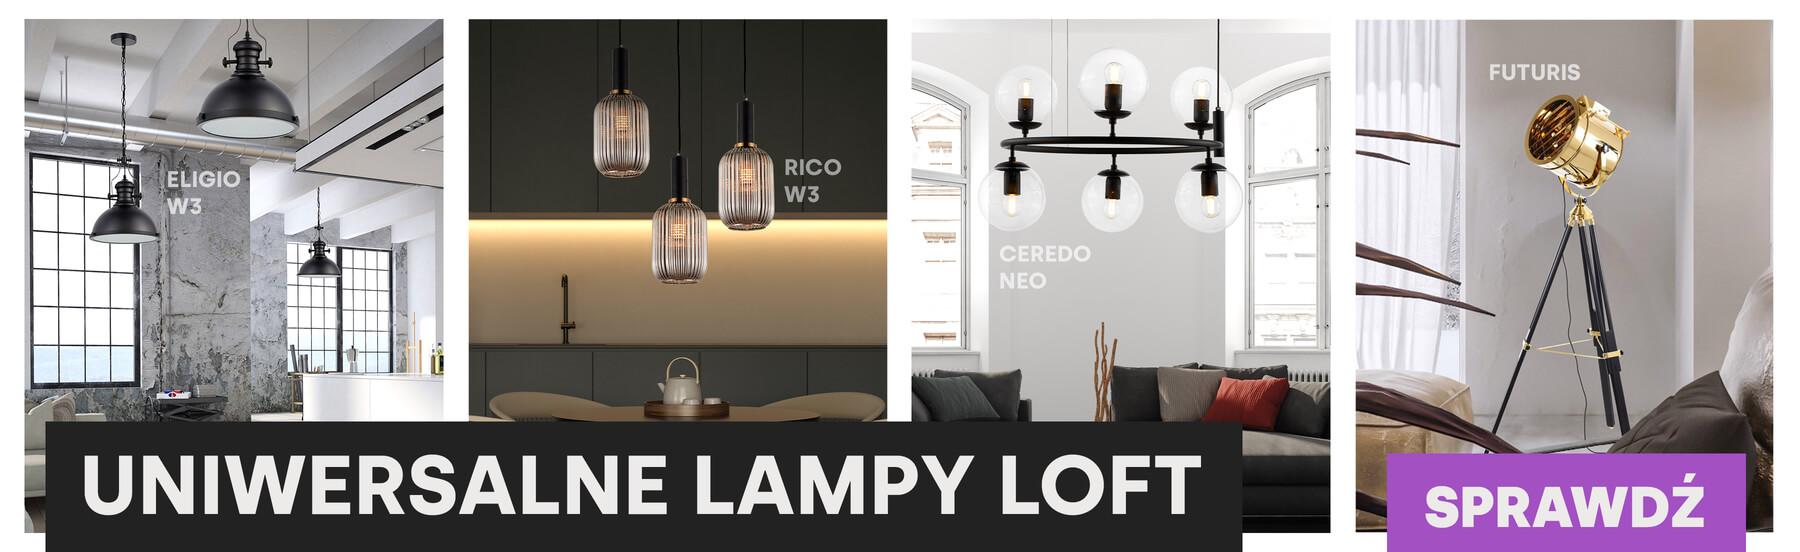 Bogaty asortyment lamp loftowych